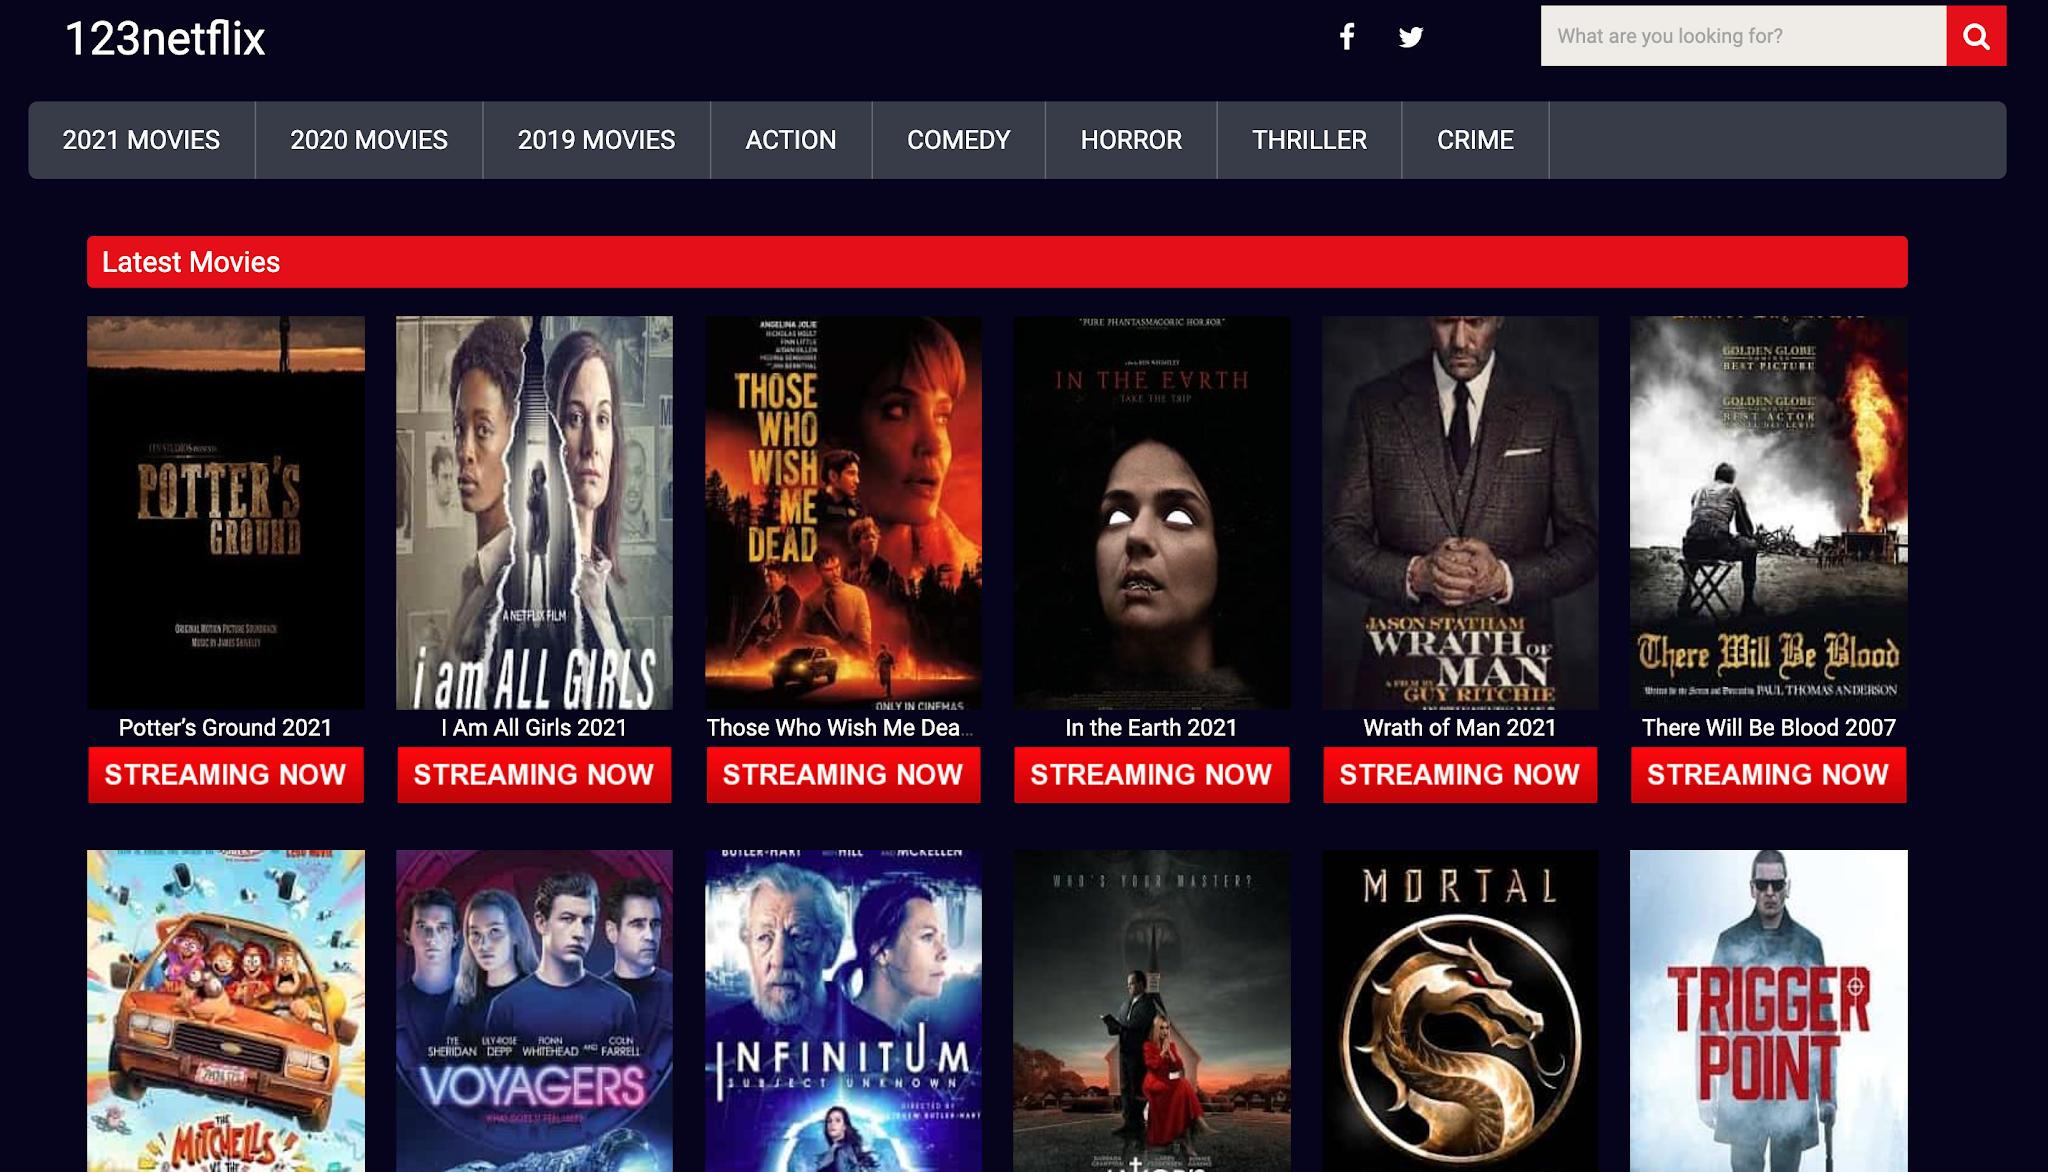 123netflix cinema movies